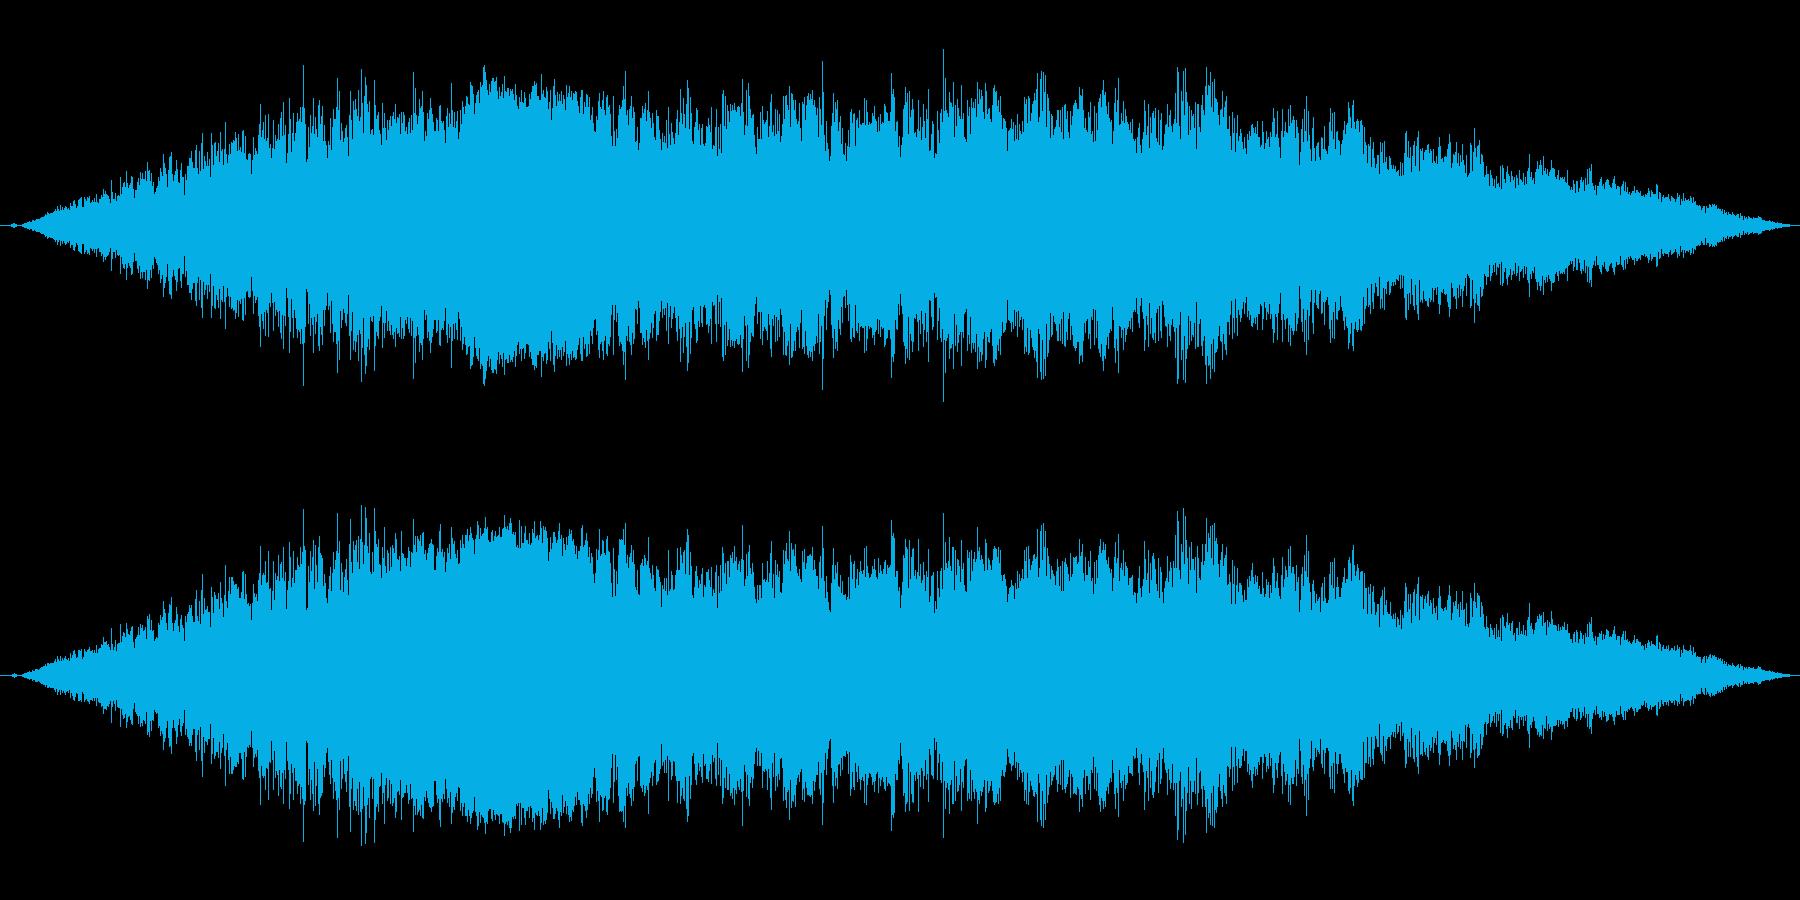 【F1】超ド迫力のF1エンジン効果音2!の再生済みの波形